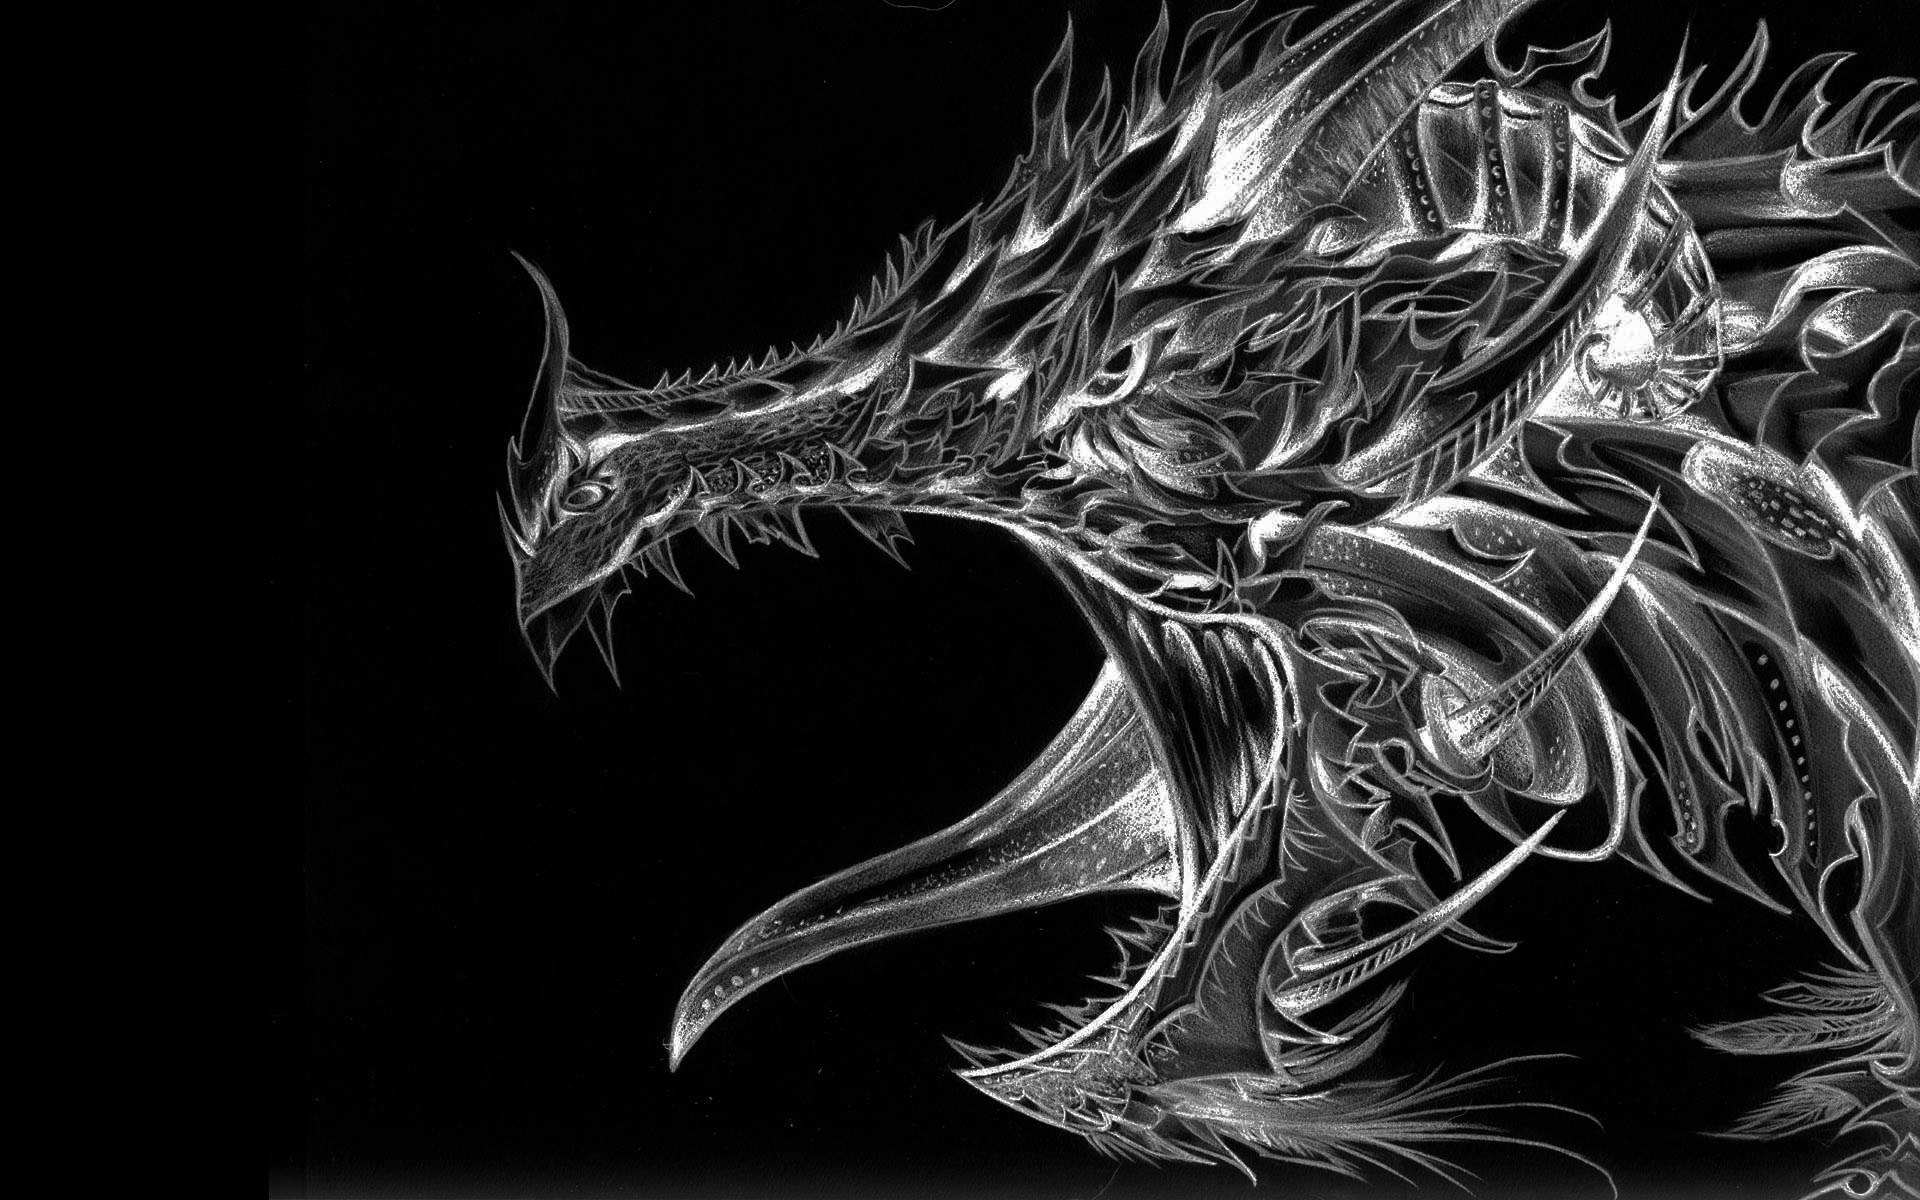 wallpaper dragons dragon images 1920×1200